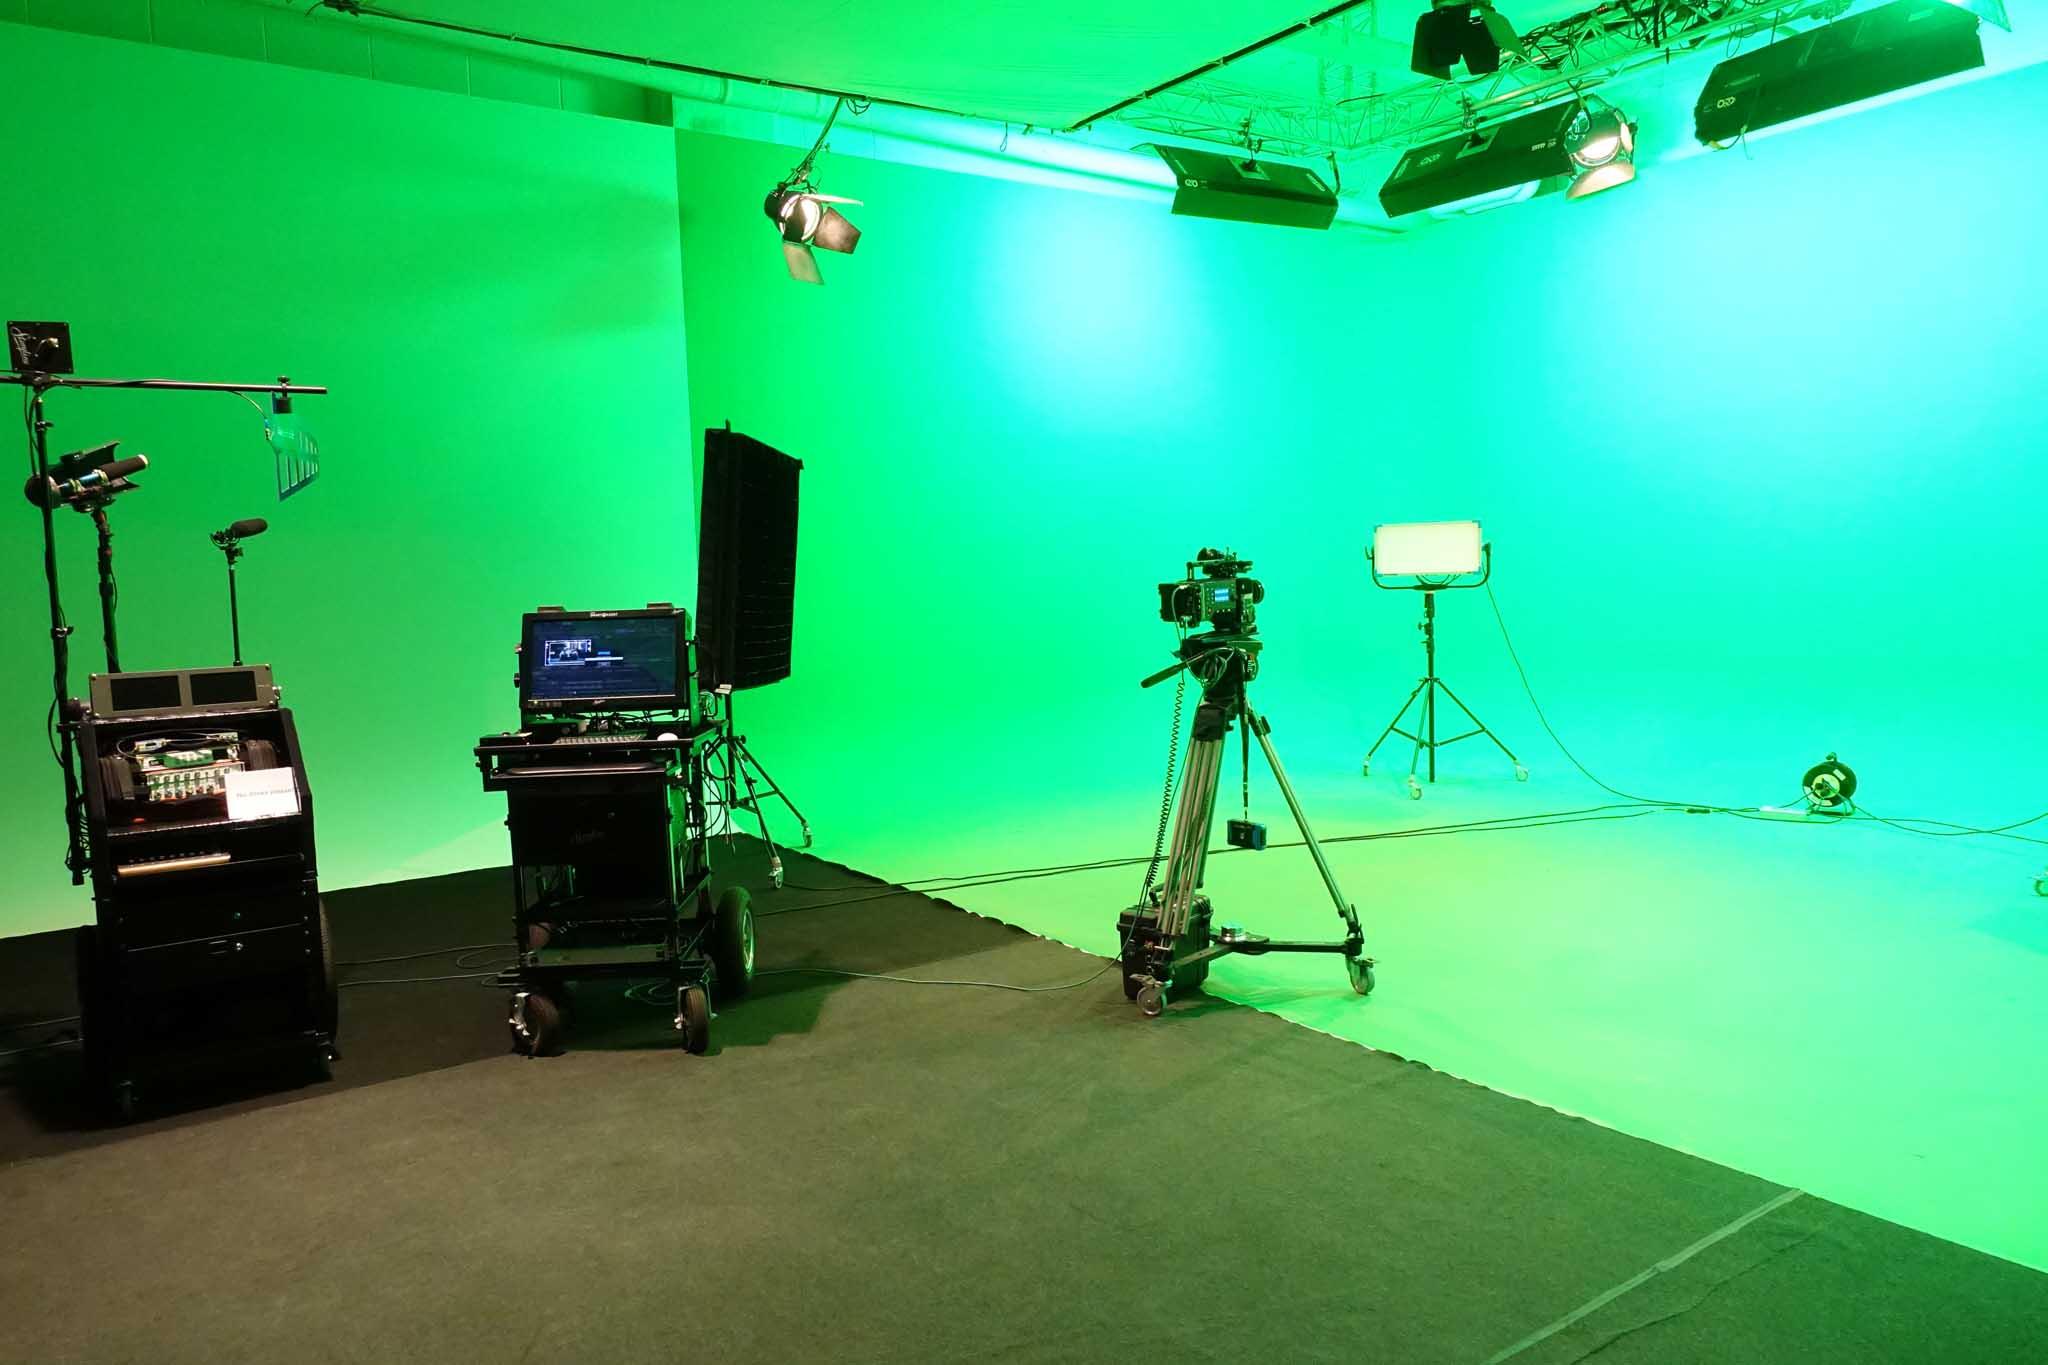 Studio with Green screen